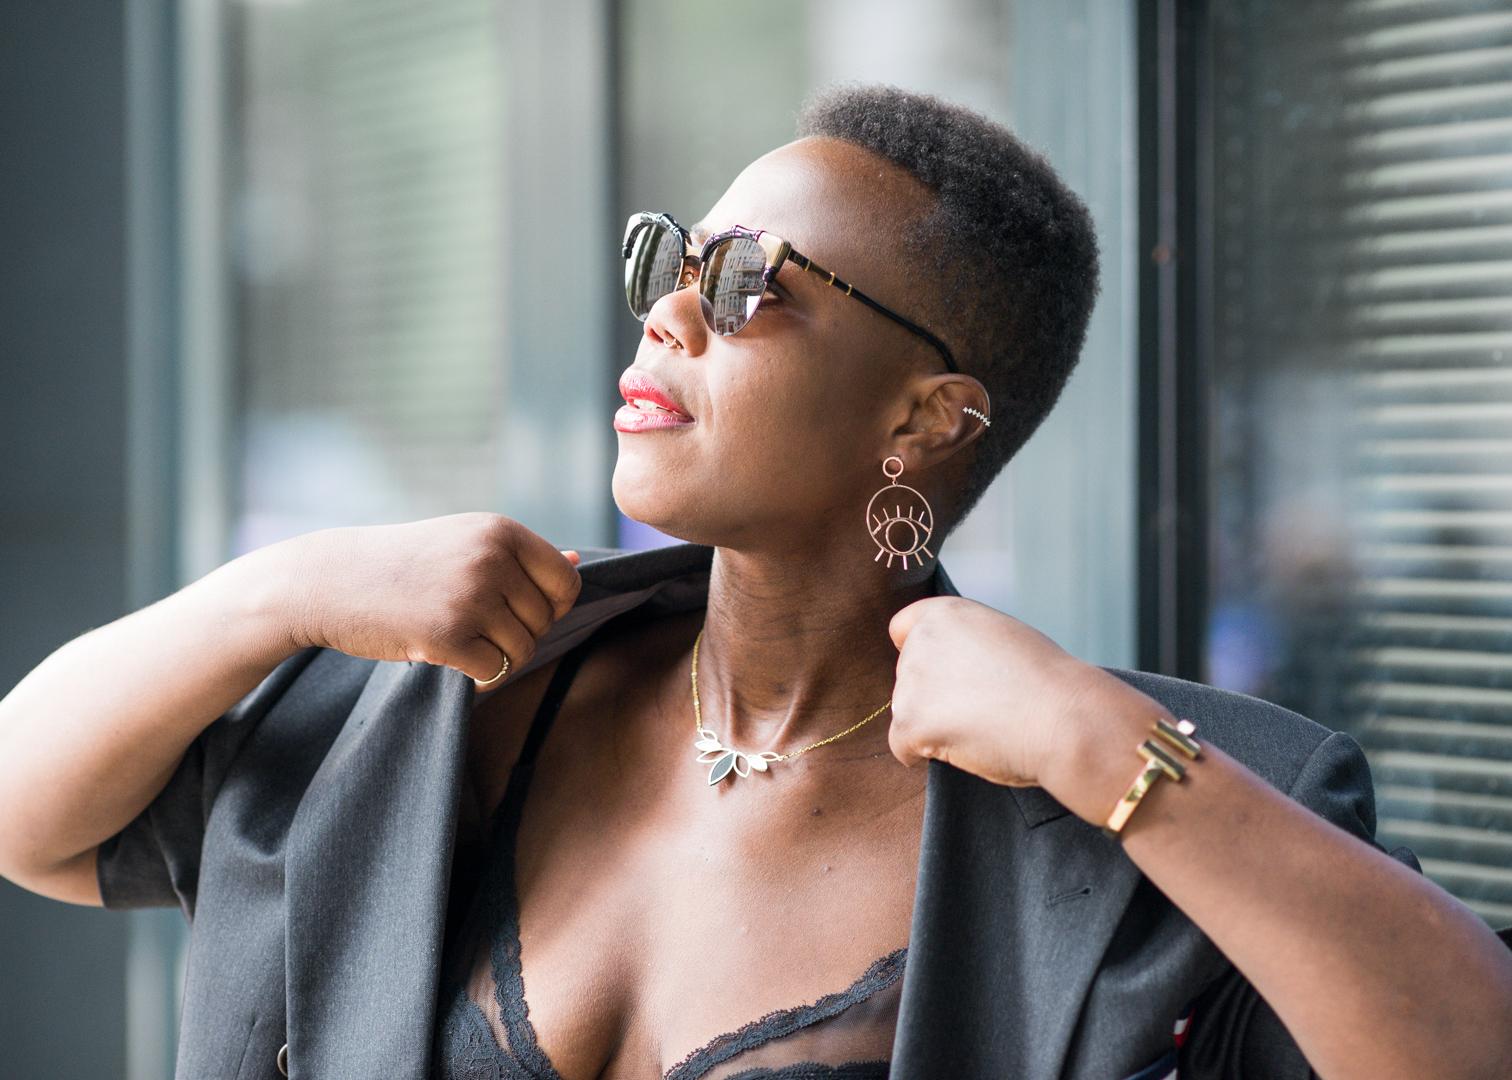 Black girl with 80s haircut